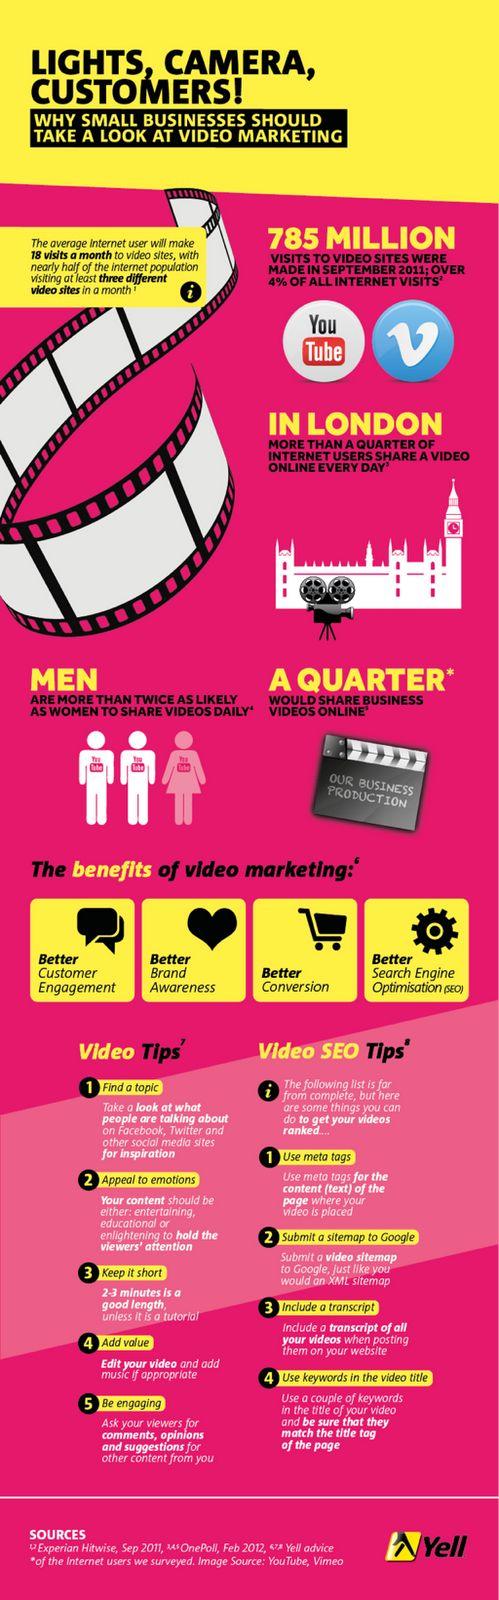 Videomarketing para pymes #infografia #infographic #socialmedia #marketing…